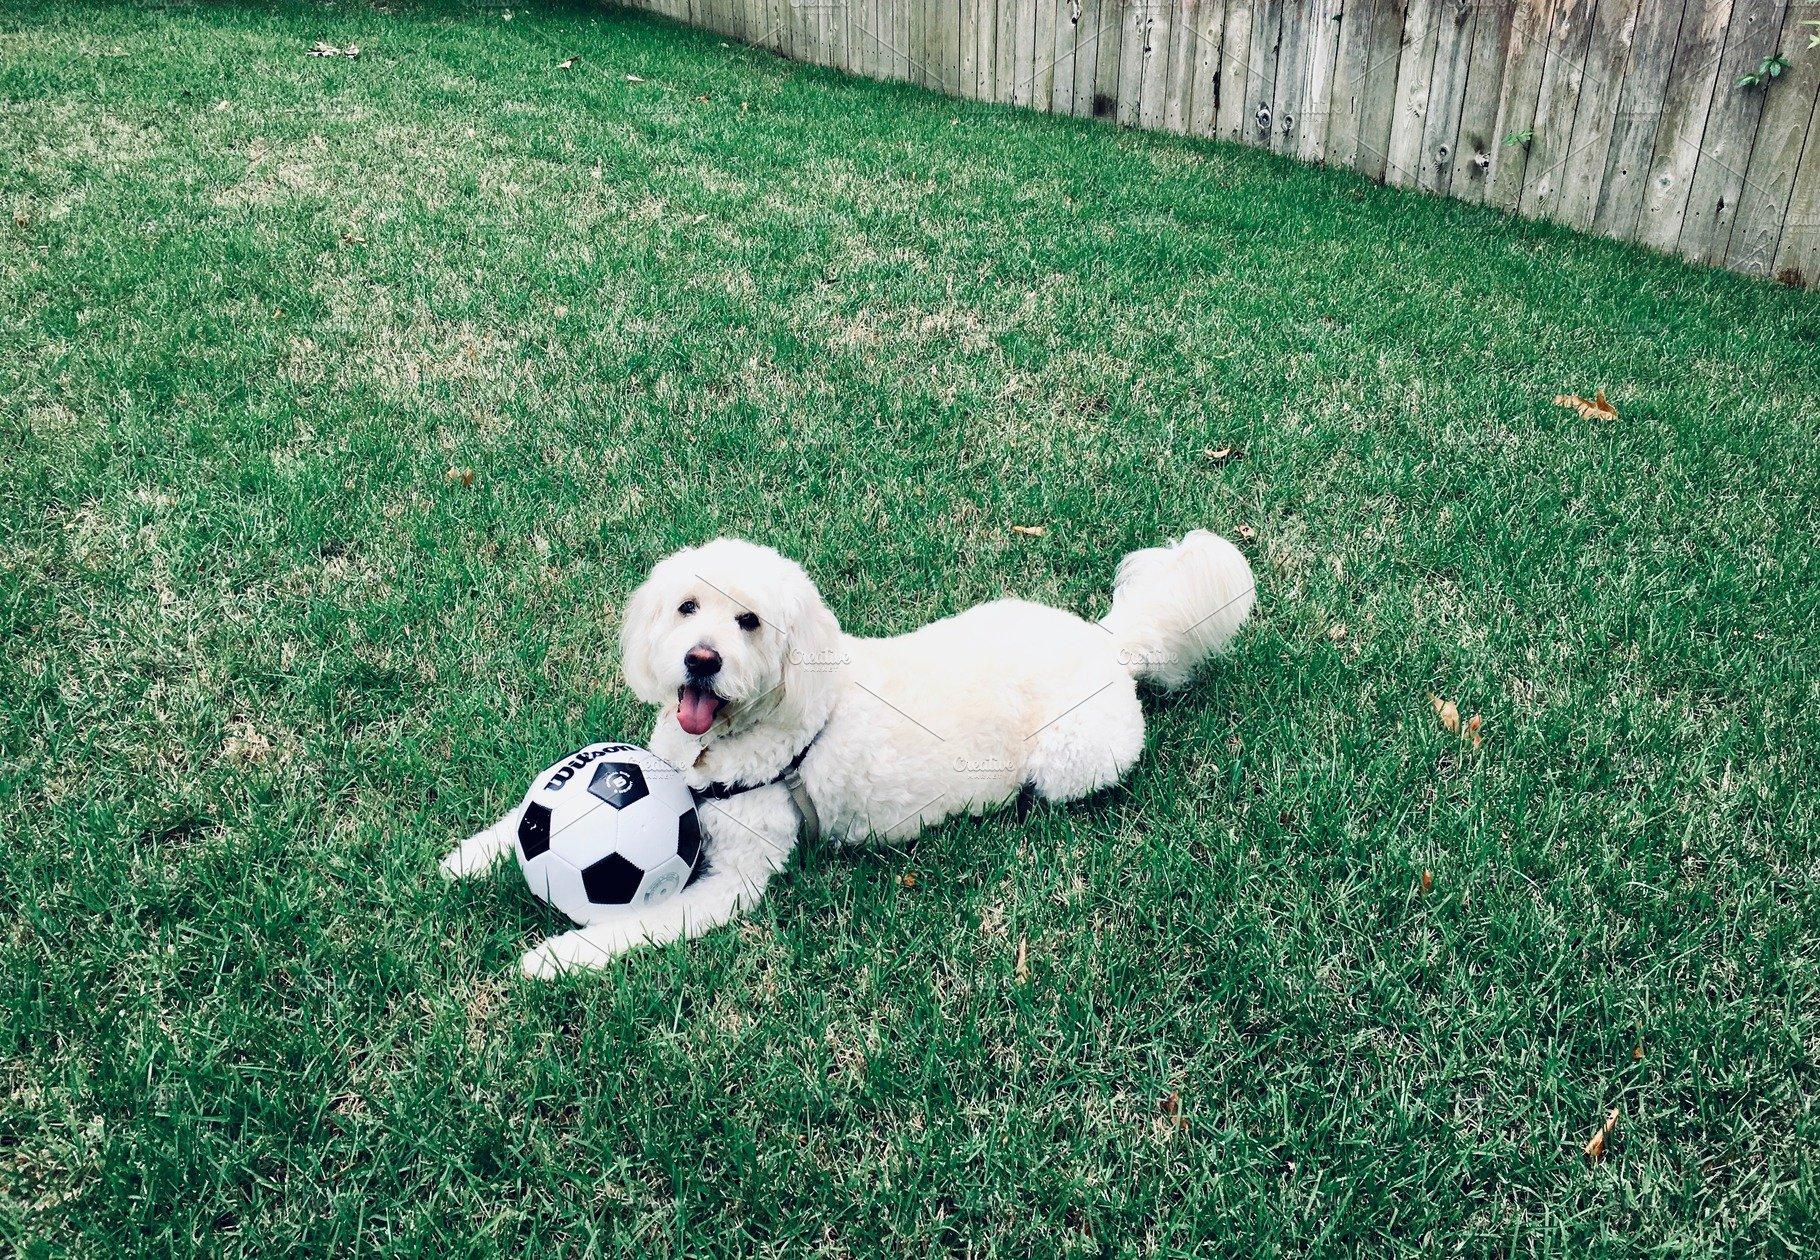 Goldendoodle Dog Playing Soccer